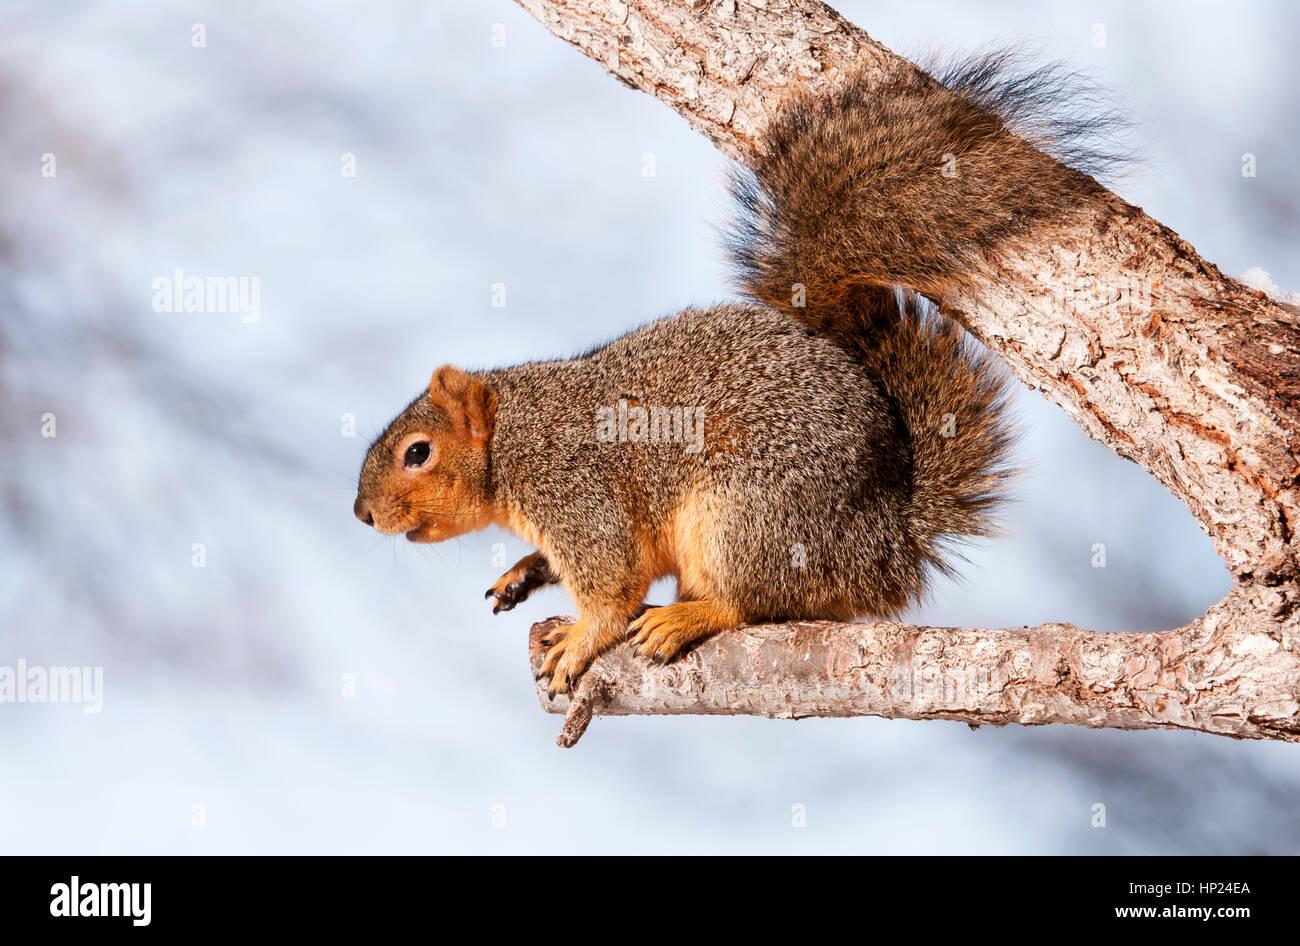 Eastern Fox Squirrel Idaho Stock Photo 134042450 Alamy